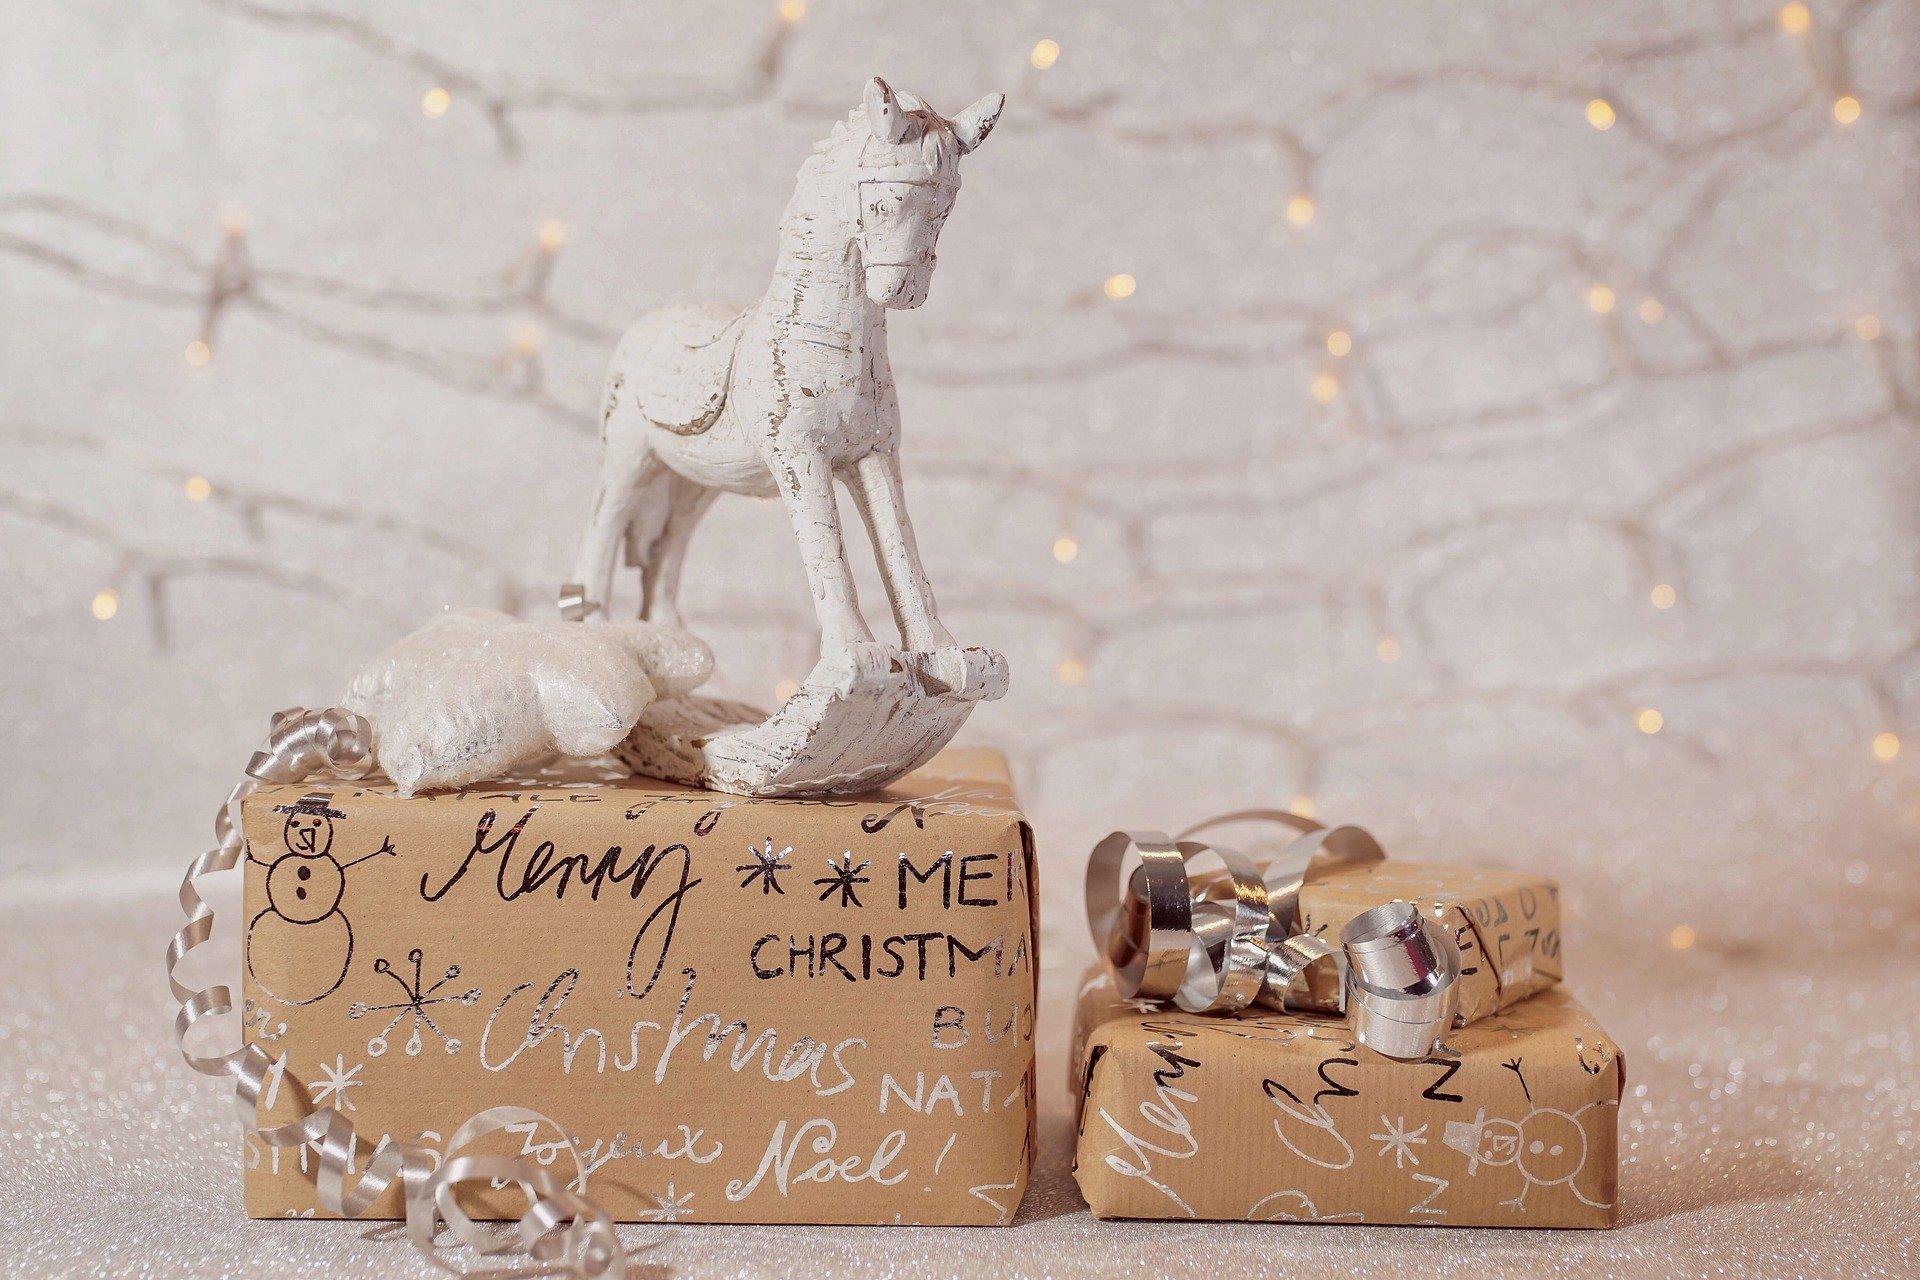 christmas-4649793_1920.jpg